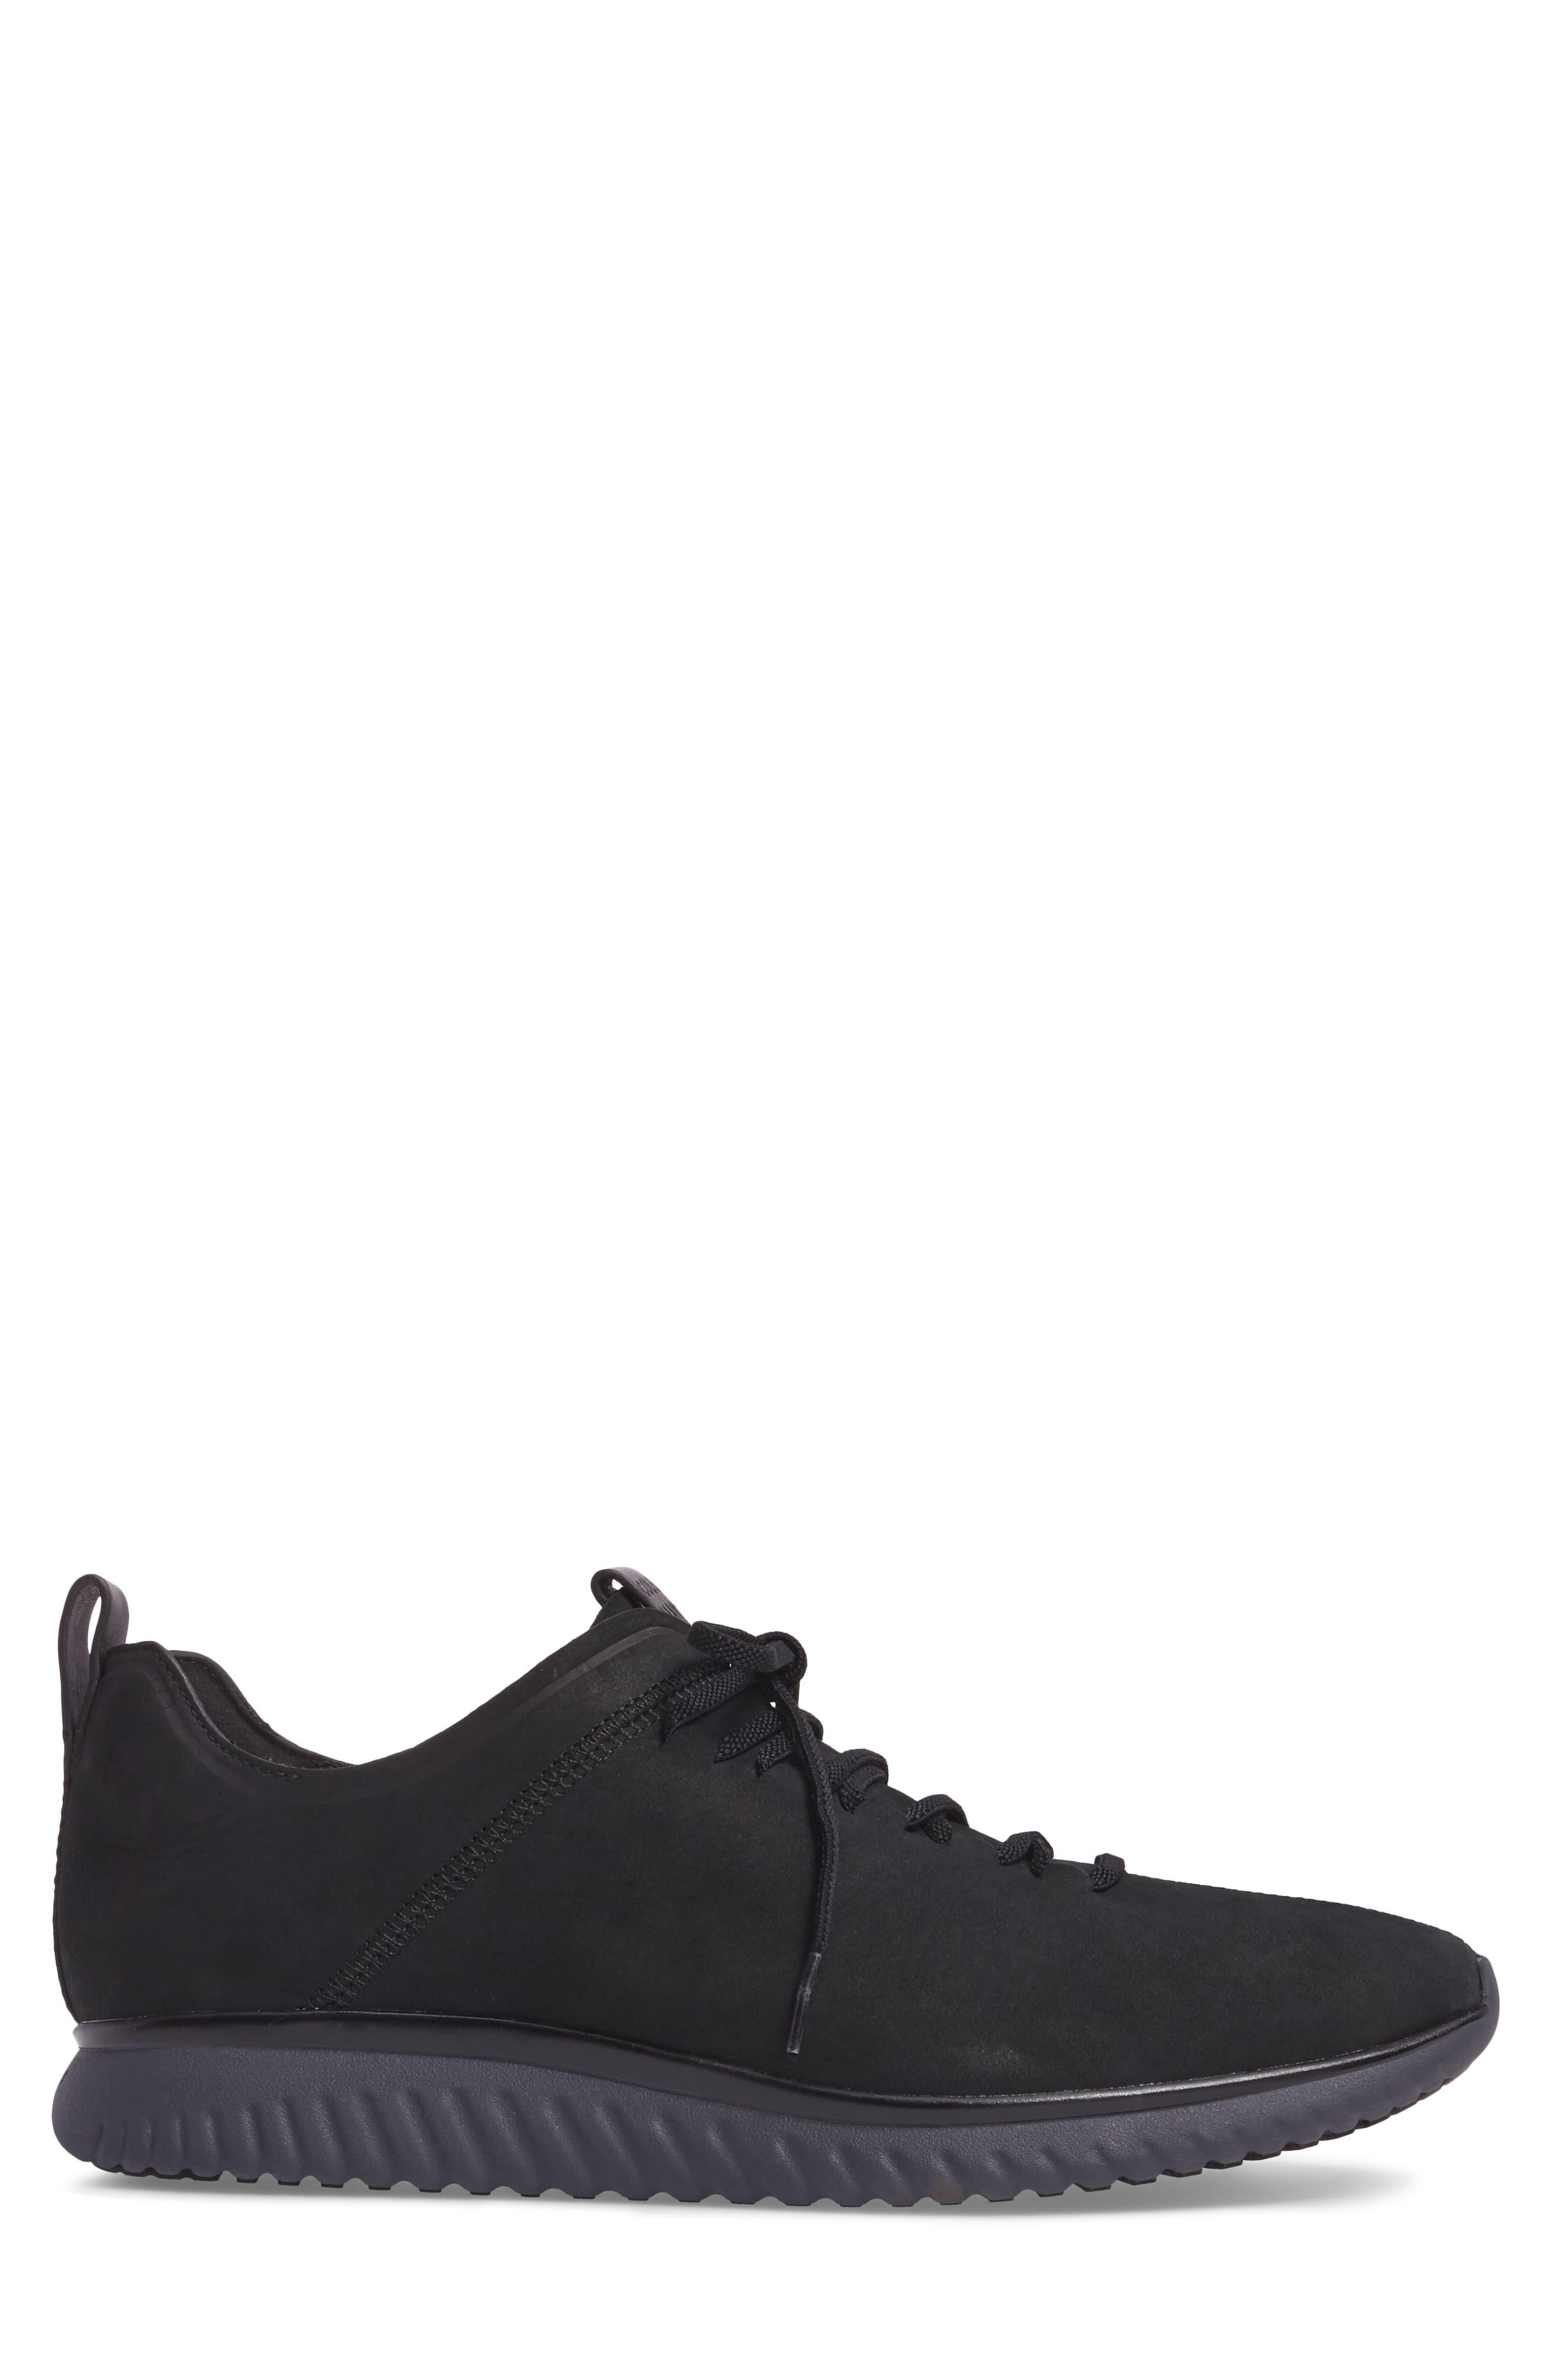 2.ZeroGrand Sneaker,                             Alternate thumbnail 3, color,                             001